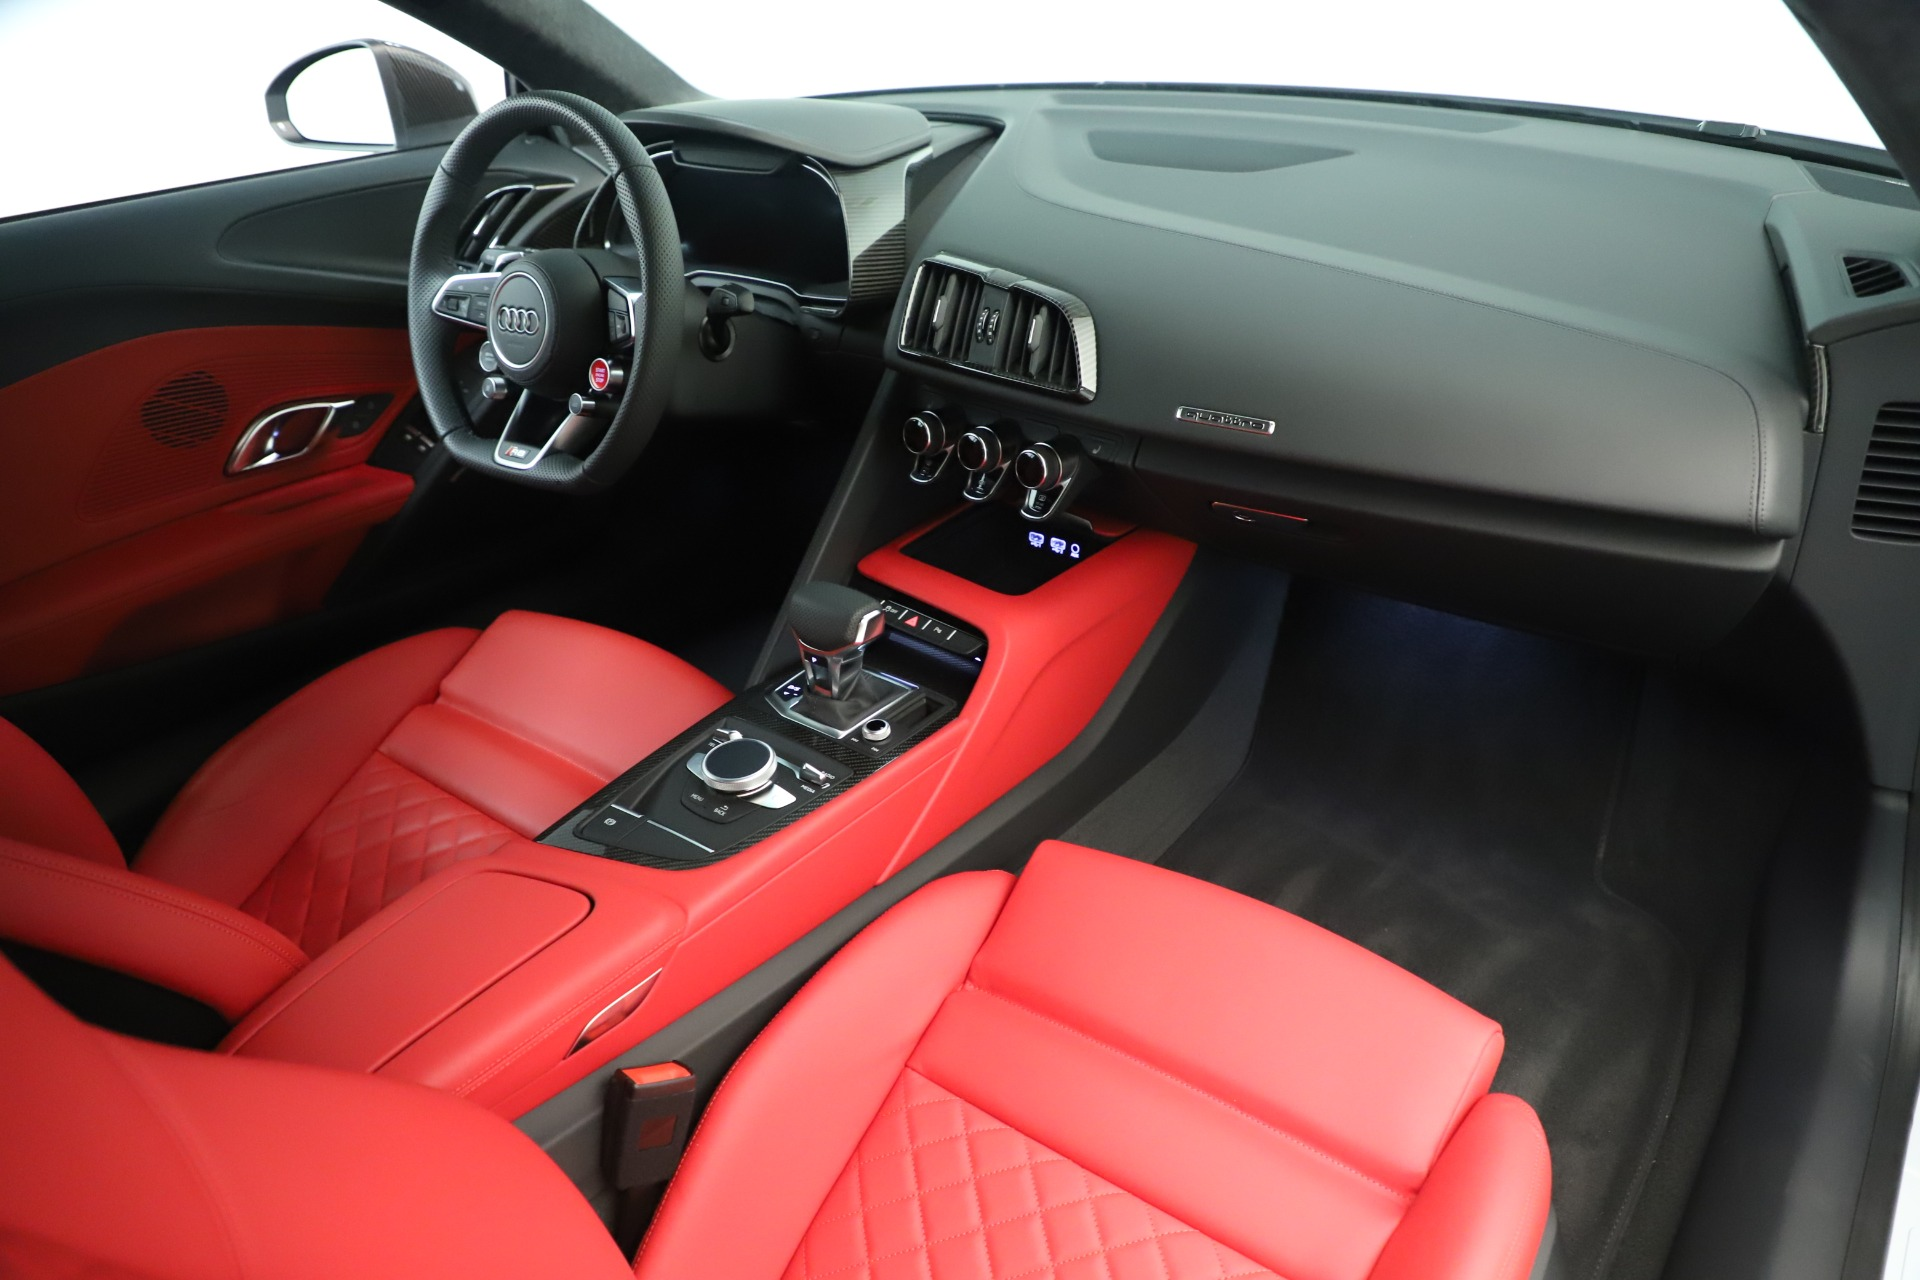 Used 2018 Audi R8 5.2 quattro V10 Plus | Greenwich, CT